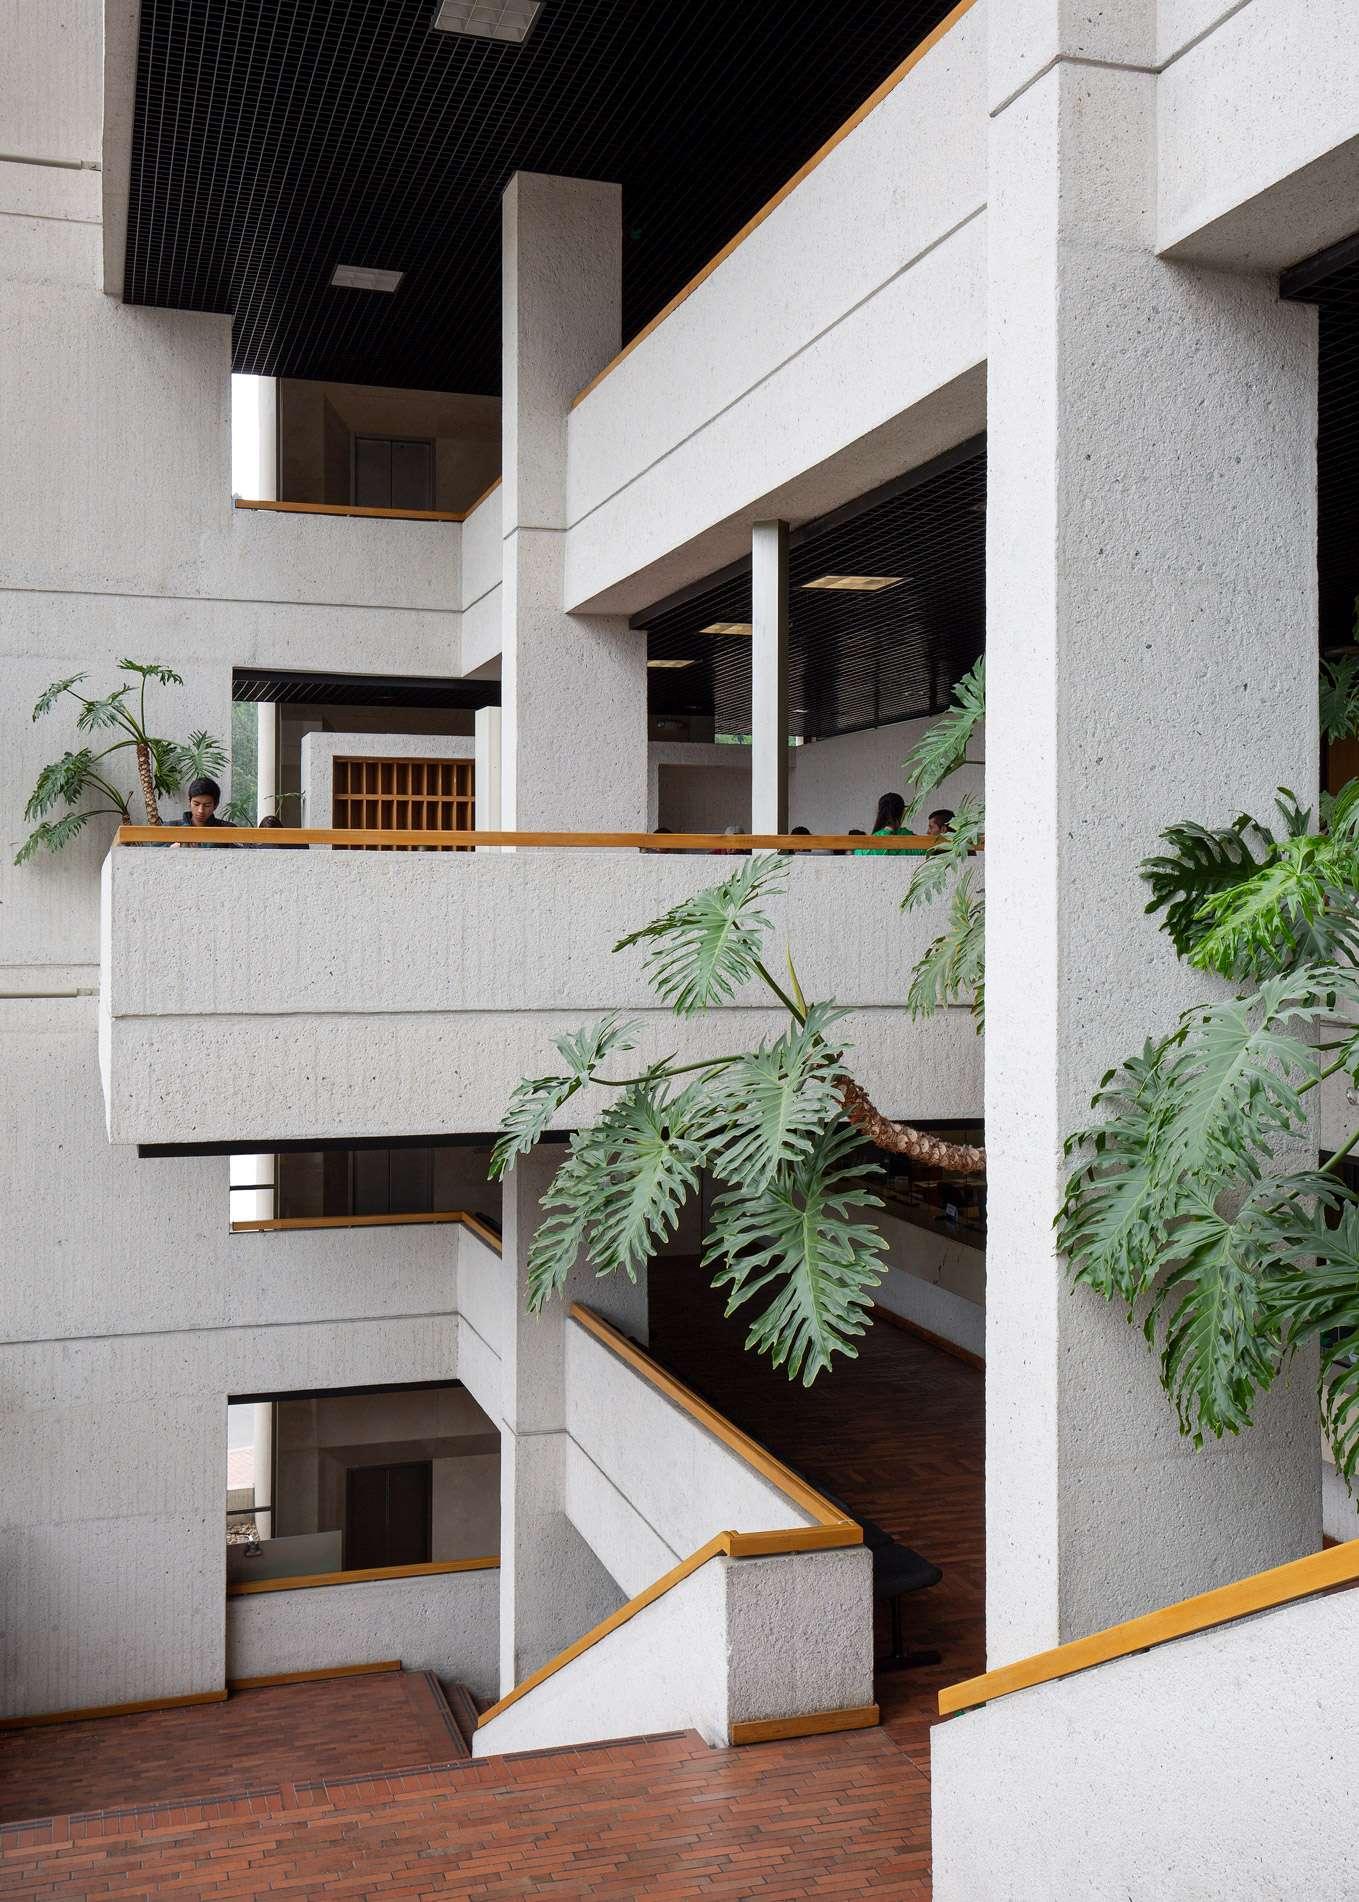 05.posgrados.utadeo.bermudez.arquitectura.simon.bosch.photography.interior.bogota.colombia